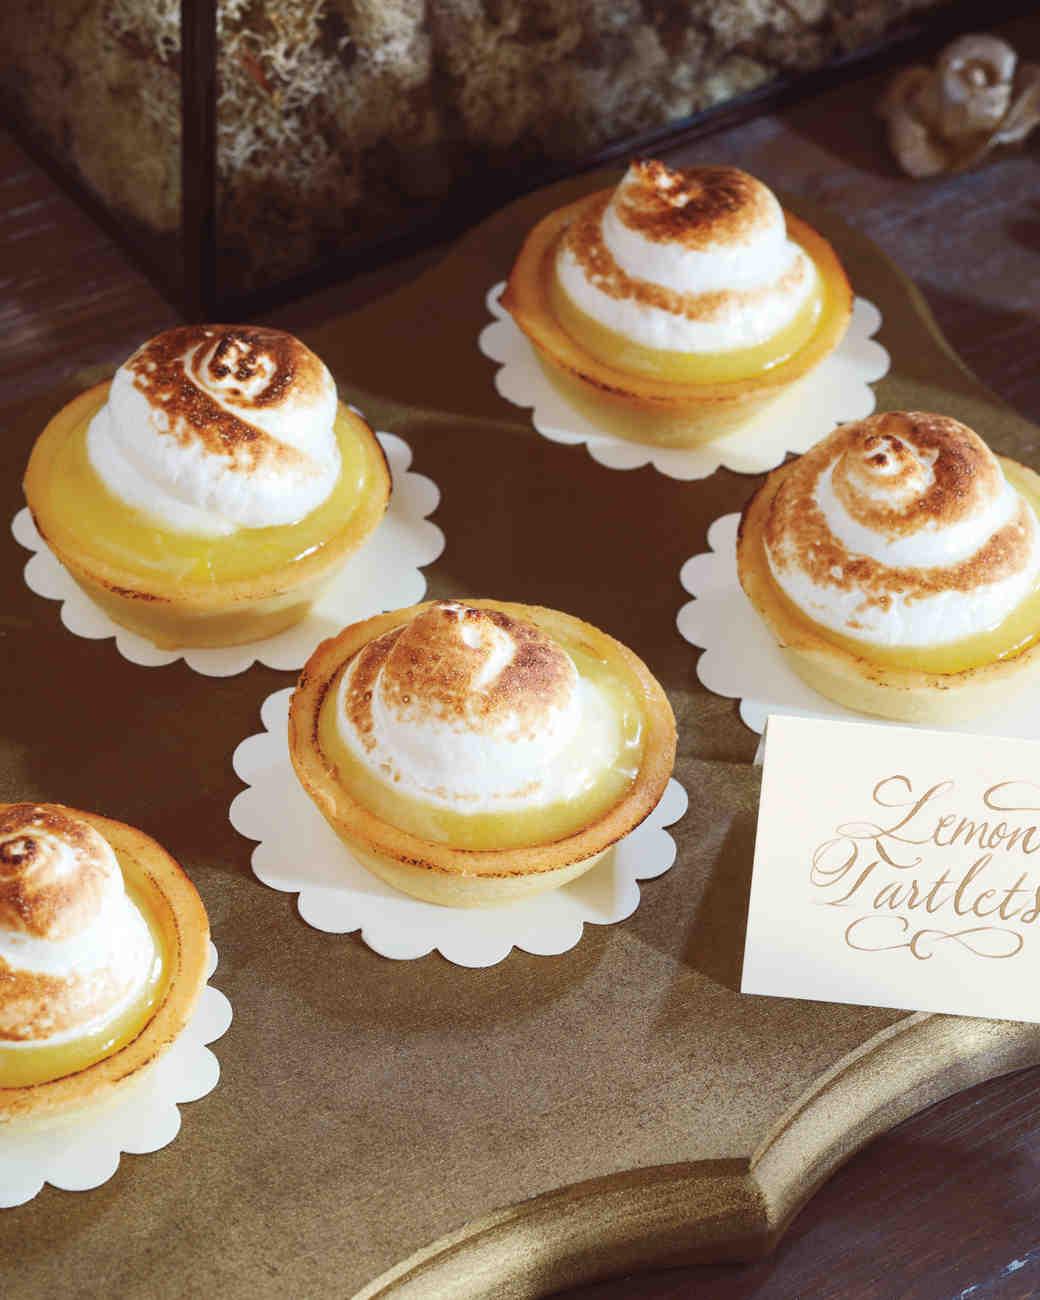 reynolds-lively-wd109335-dessert-detail-0222.jpg